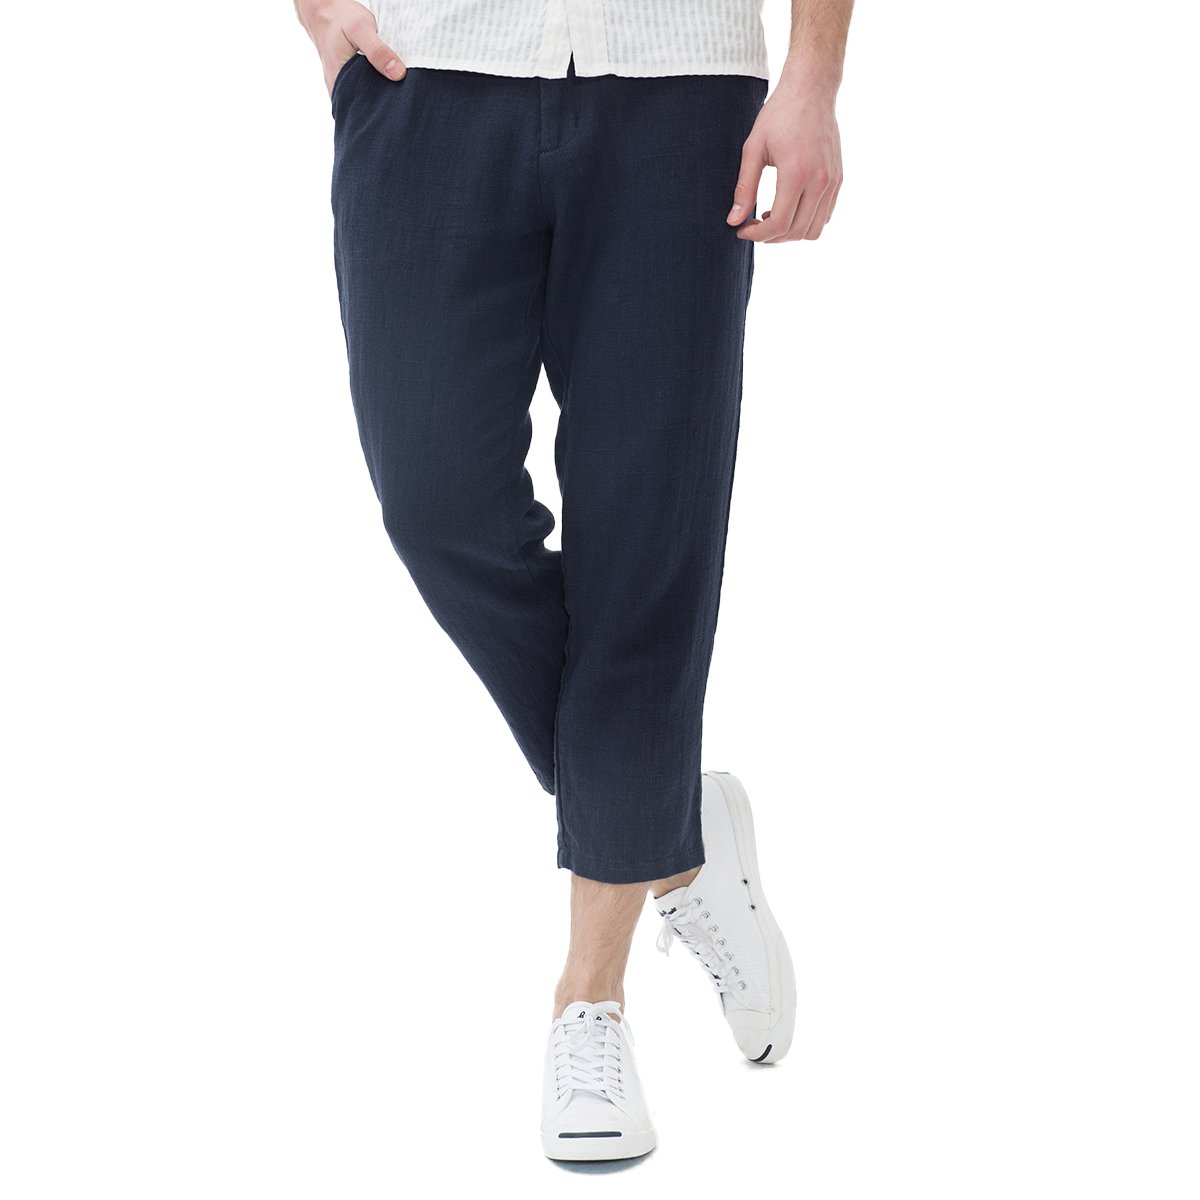 MARKLESS Men's Summer Comfort Classic Fit Causal Beach Pants